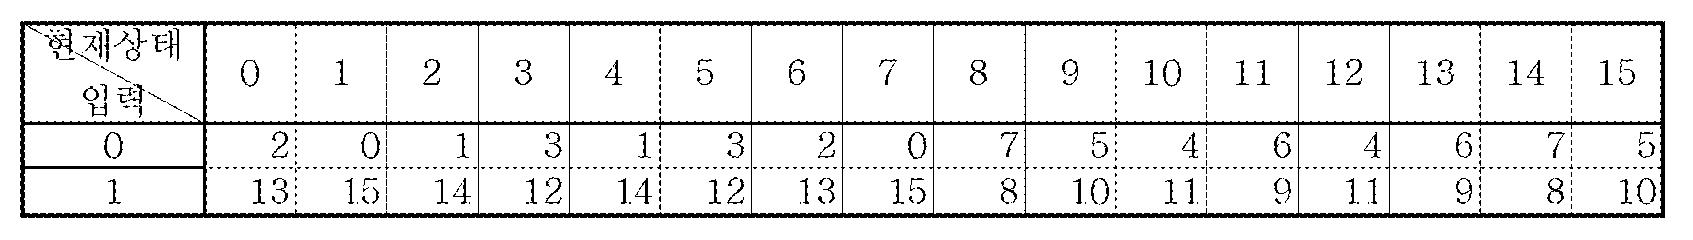 Figure 112005051695892-pat00032